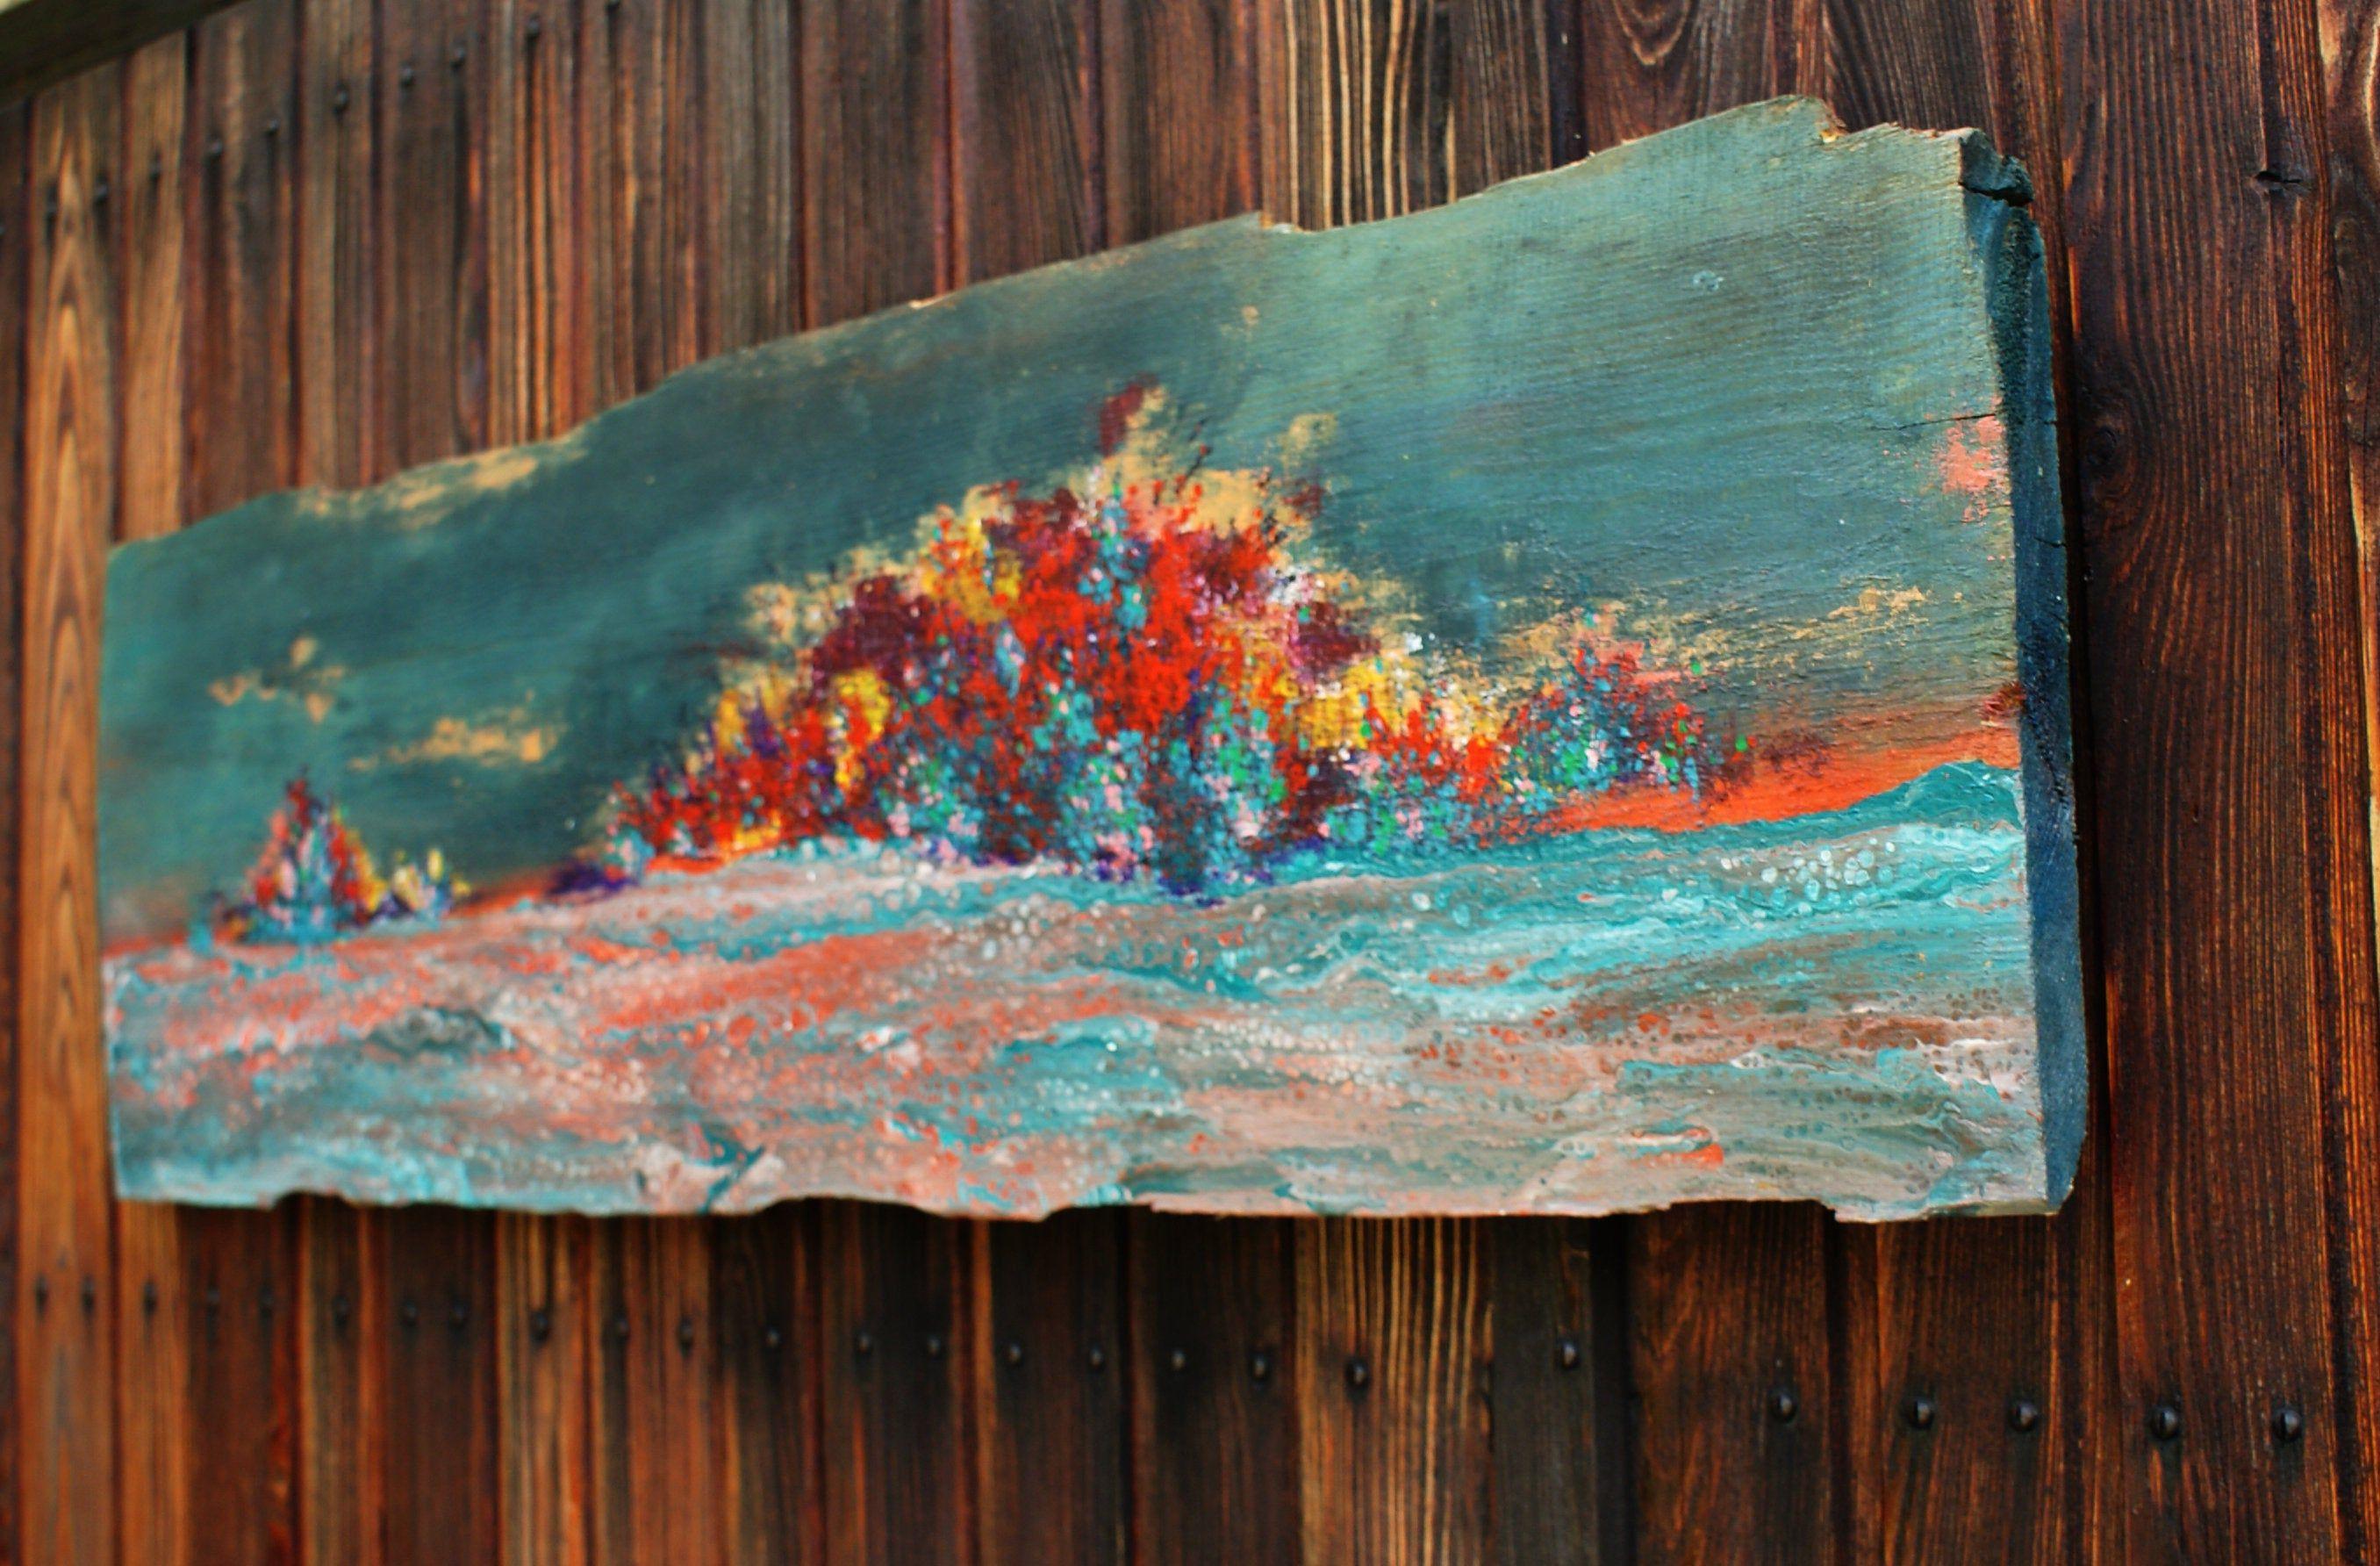 Abstrakte Malerei Auf Holz Farb Explosion Bunt Malerei Auf